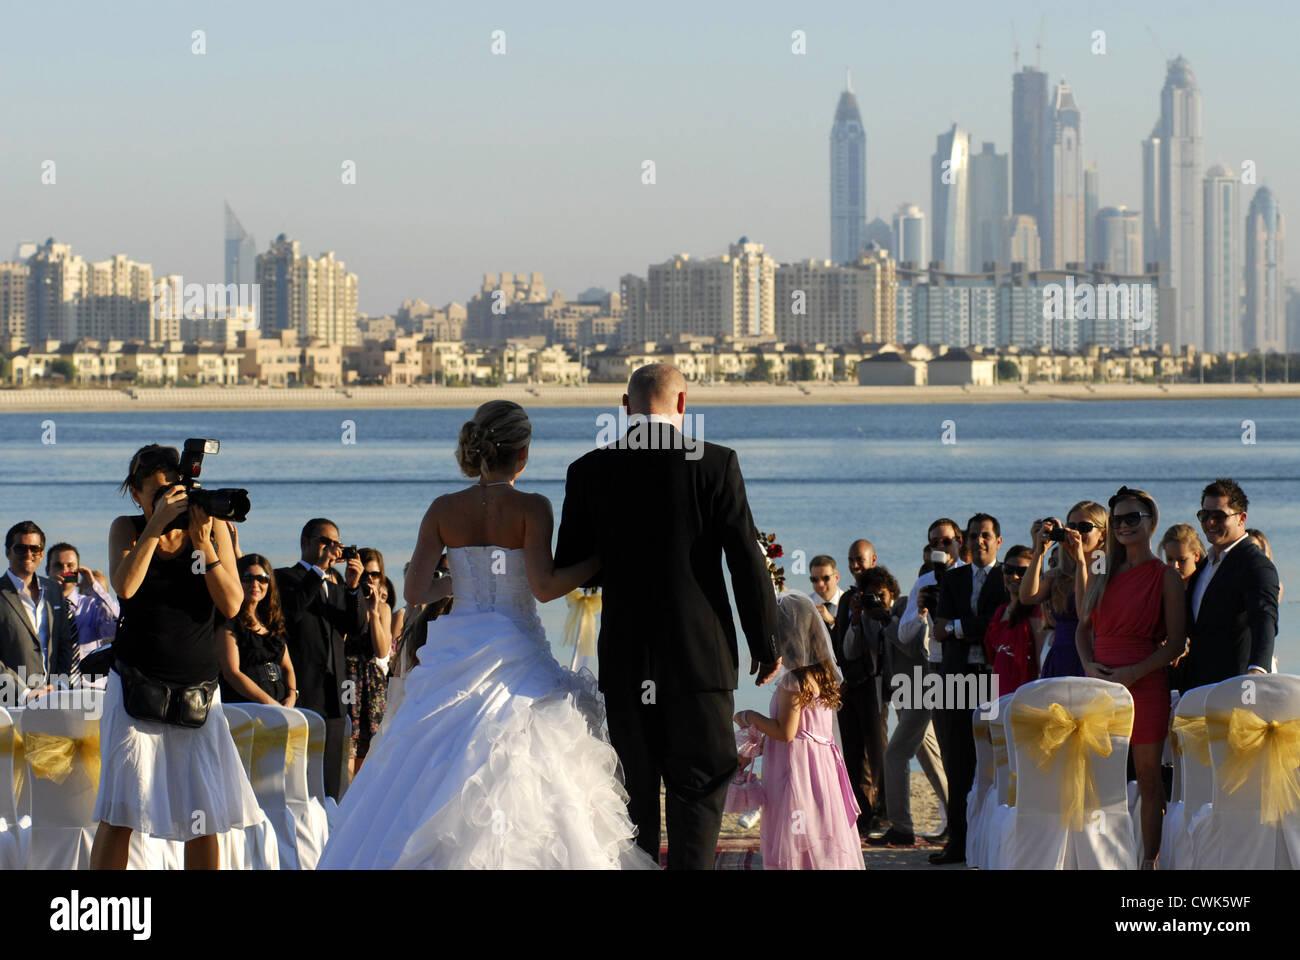 Wedding at the beach in the Atlantis Hotel, The Palm, Dubai, UAE, United Arab Emirates, Persian Gulf, Arabian Peninsula, - Stock Image